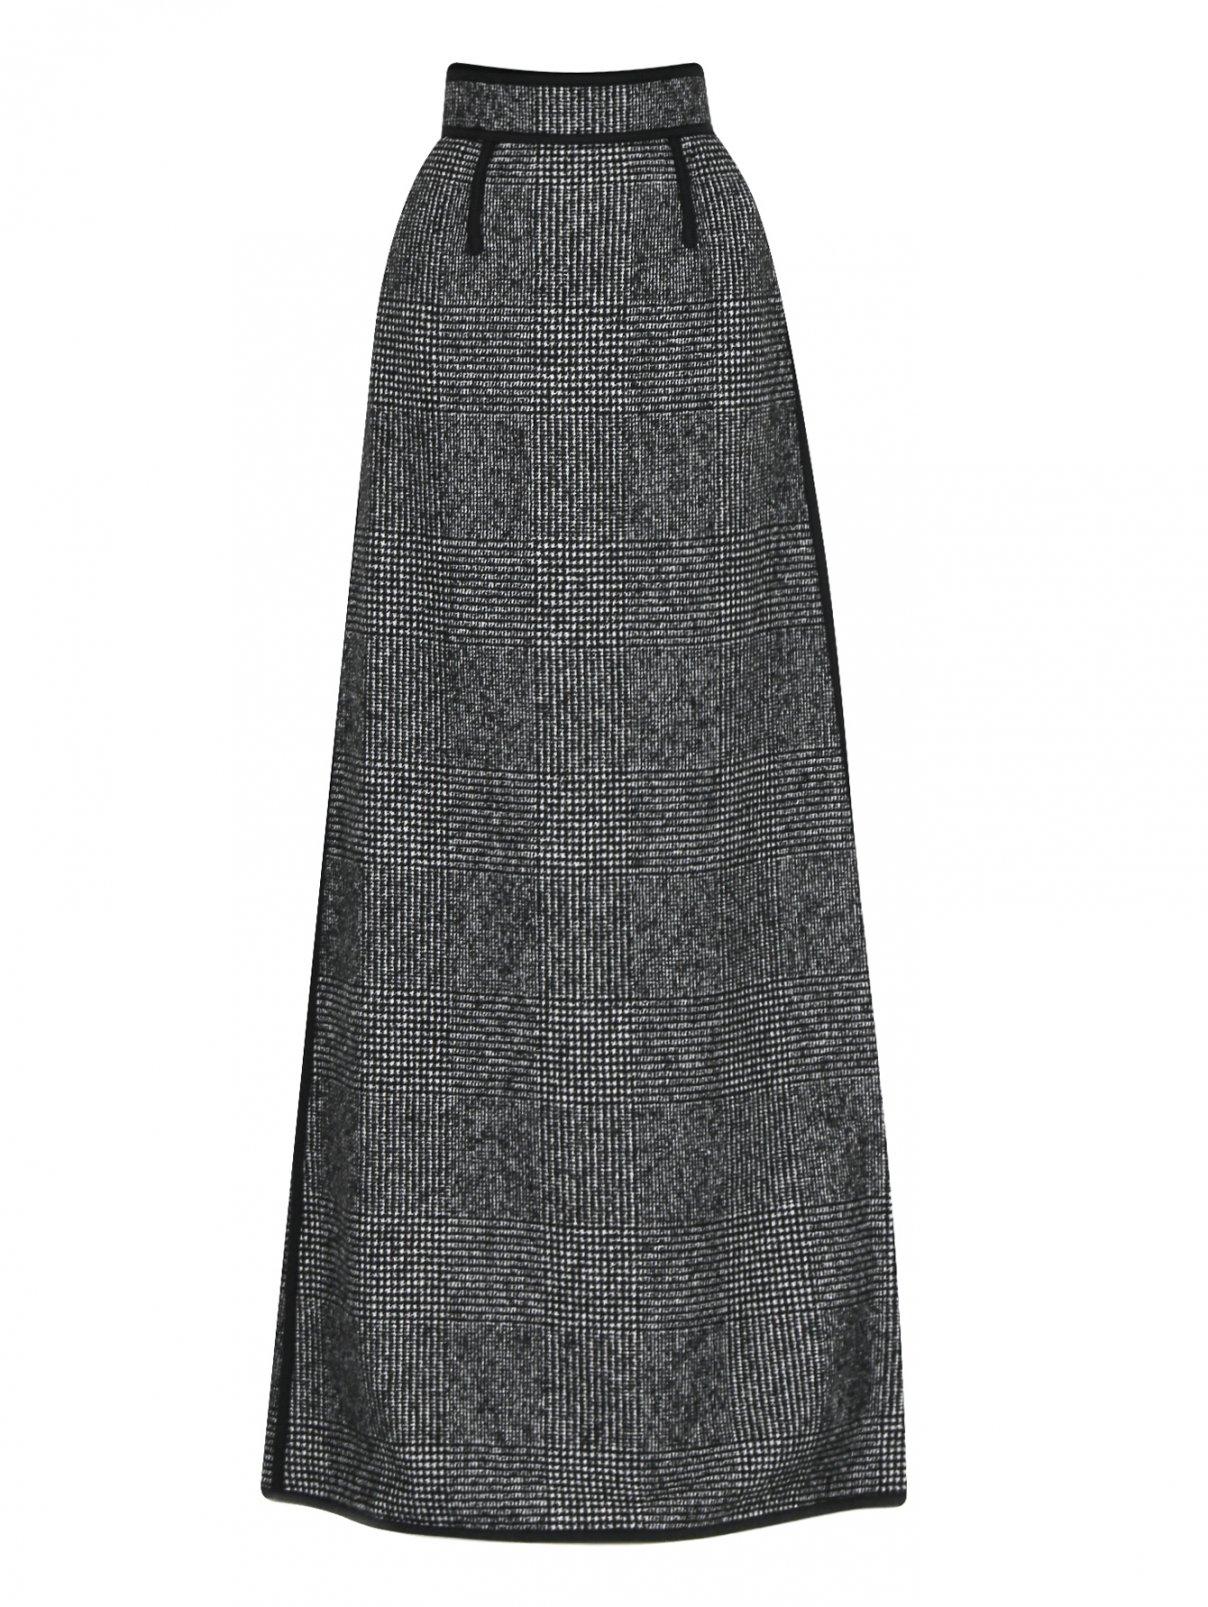 Юбка-макси из шерсти с узором Dsquared2  –  Общий вид